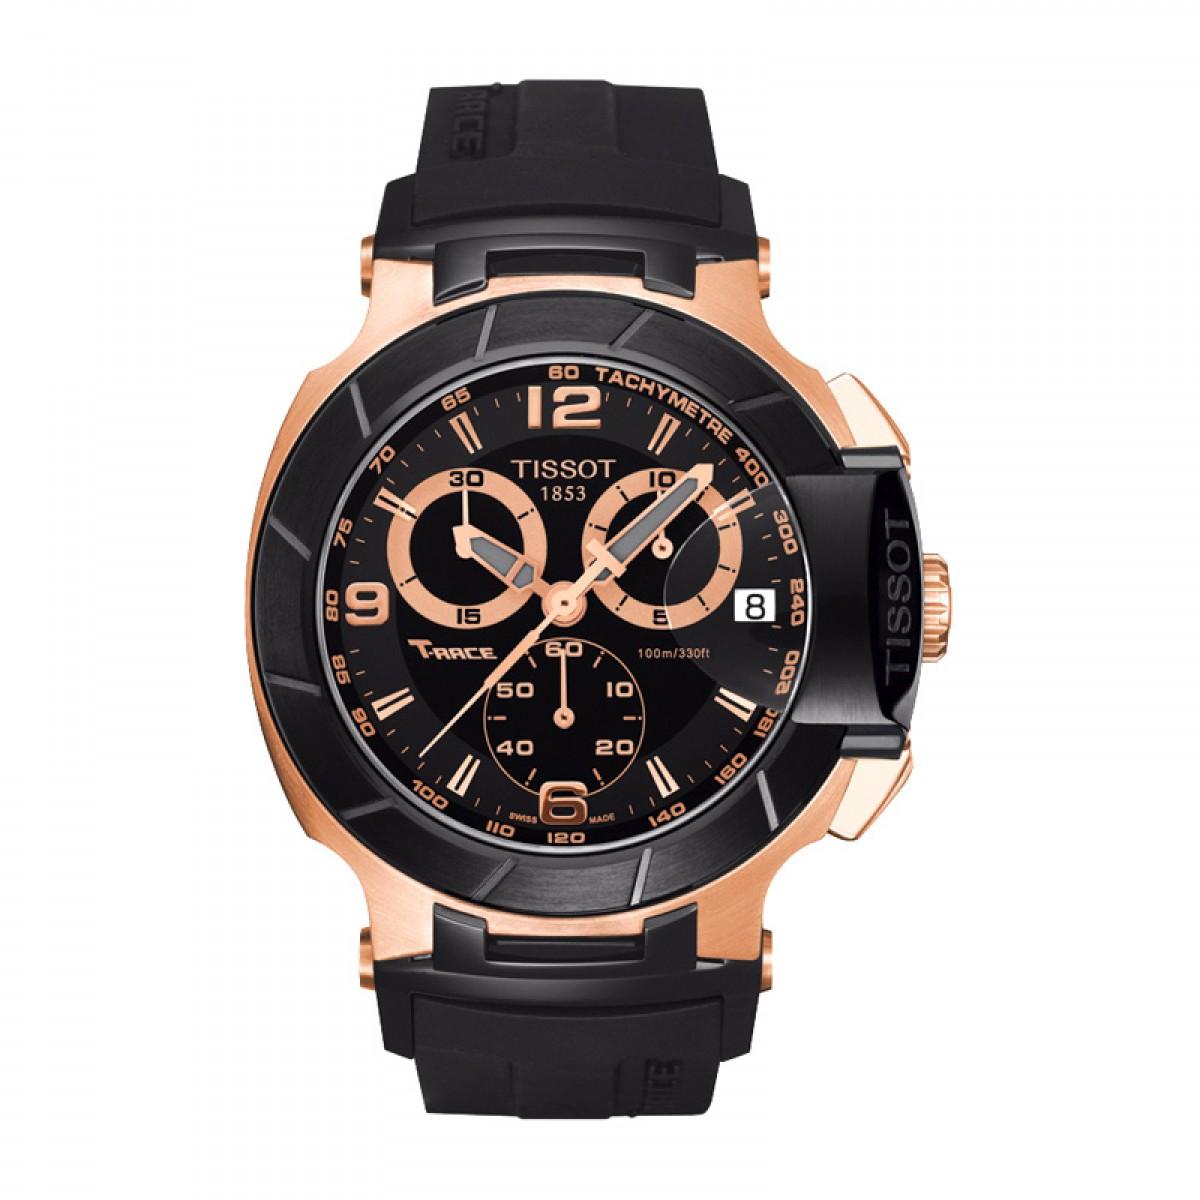 Часовник Tissot T048.417.27.057.06